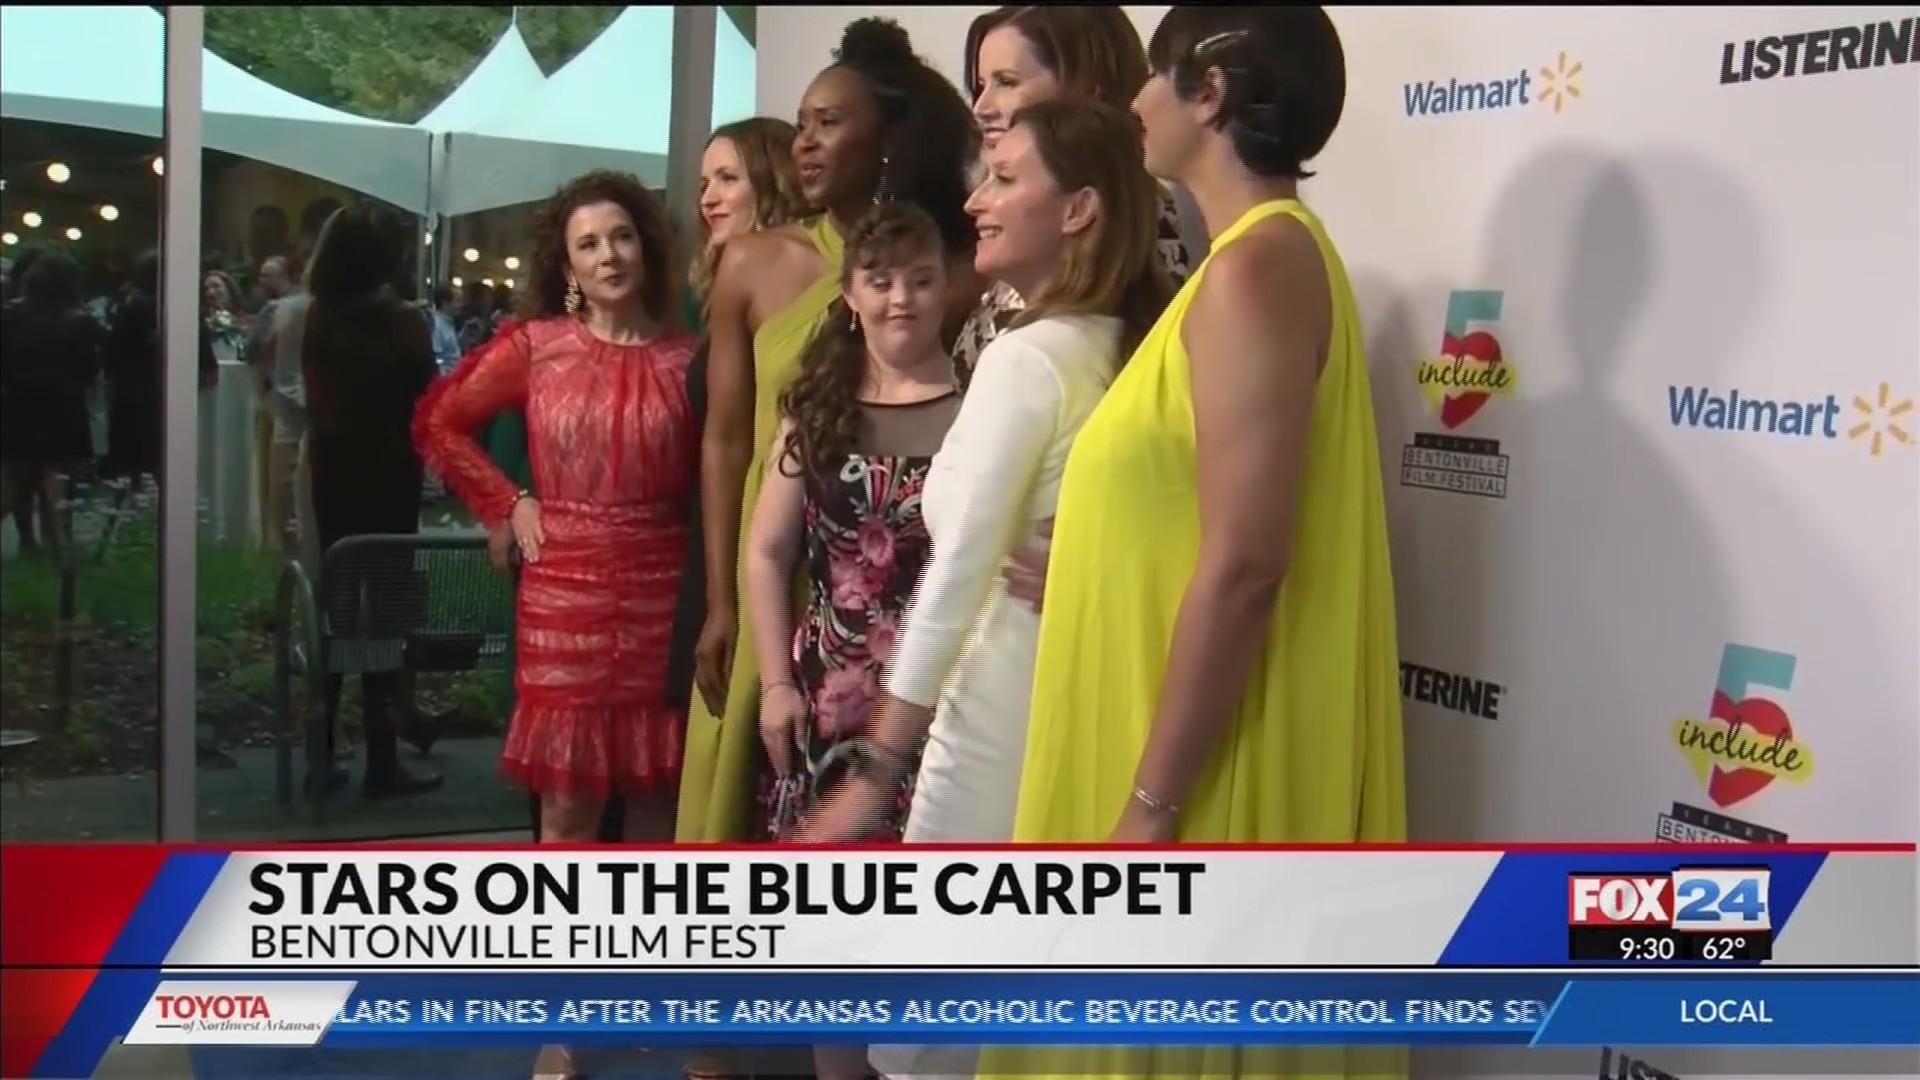 Stars_hit_Blue_Carpet_at_Bentonville_Fil_0_20190509041628